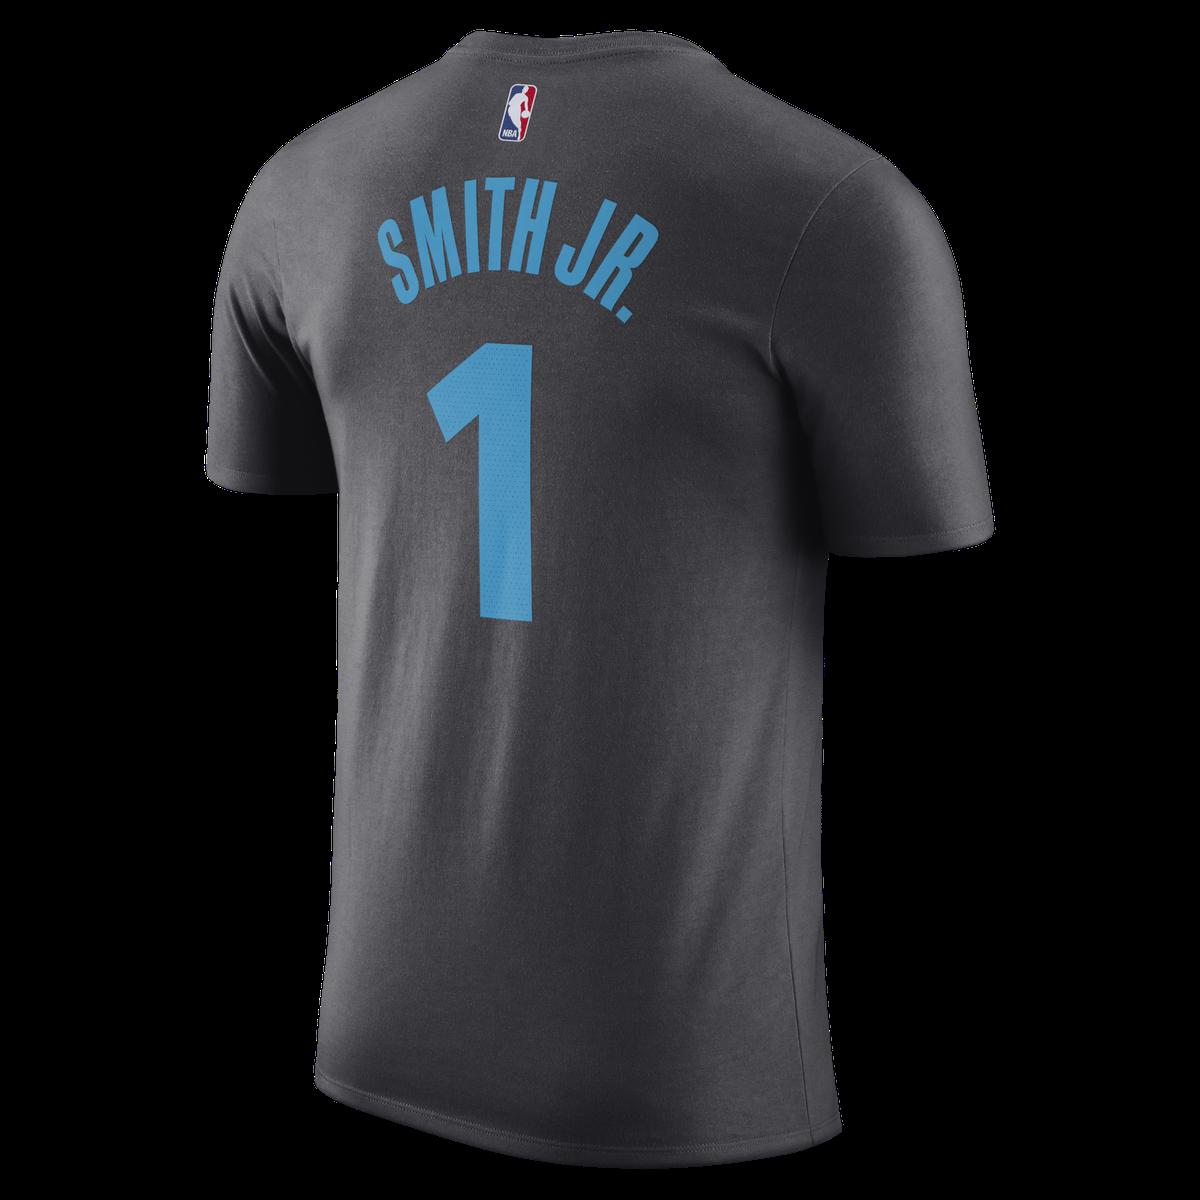 085a6c61bacd Dennis Smith Jr. Nike City Edition T-Shirt for  34.99 Fanatics